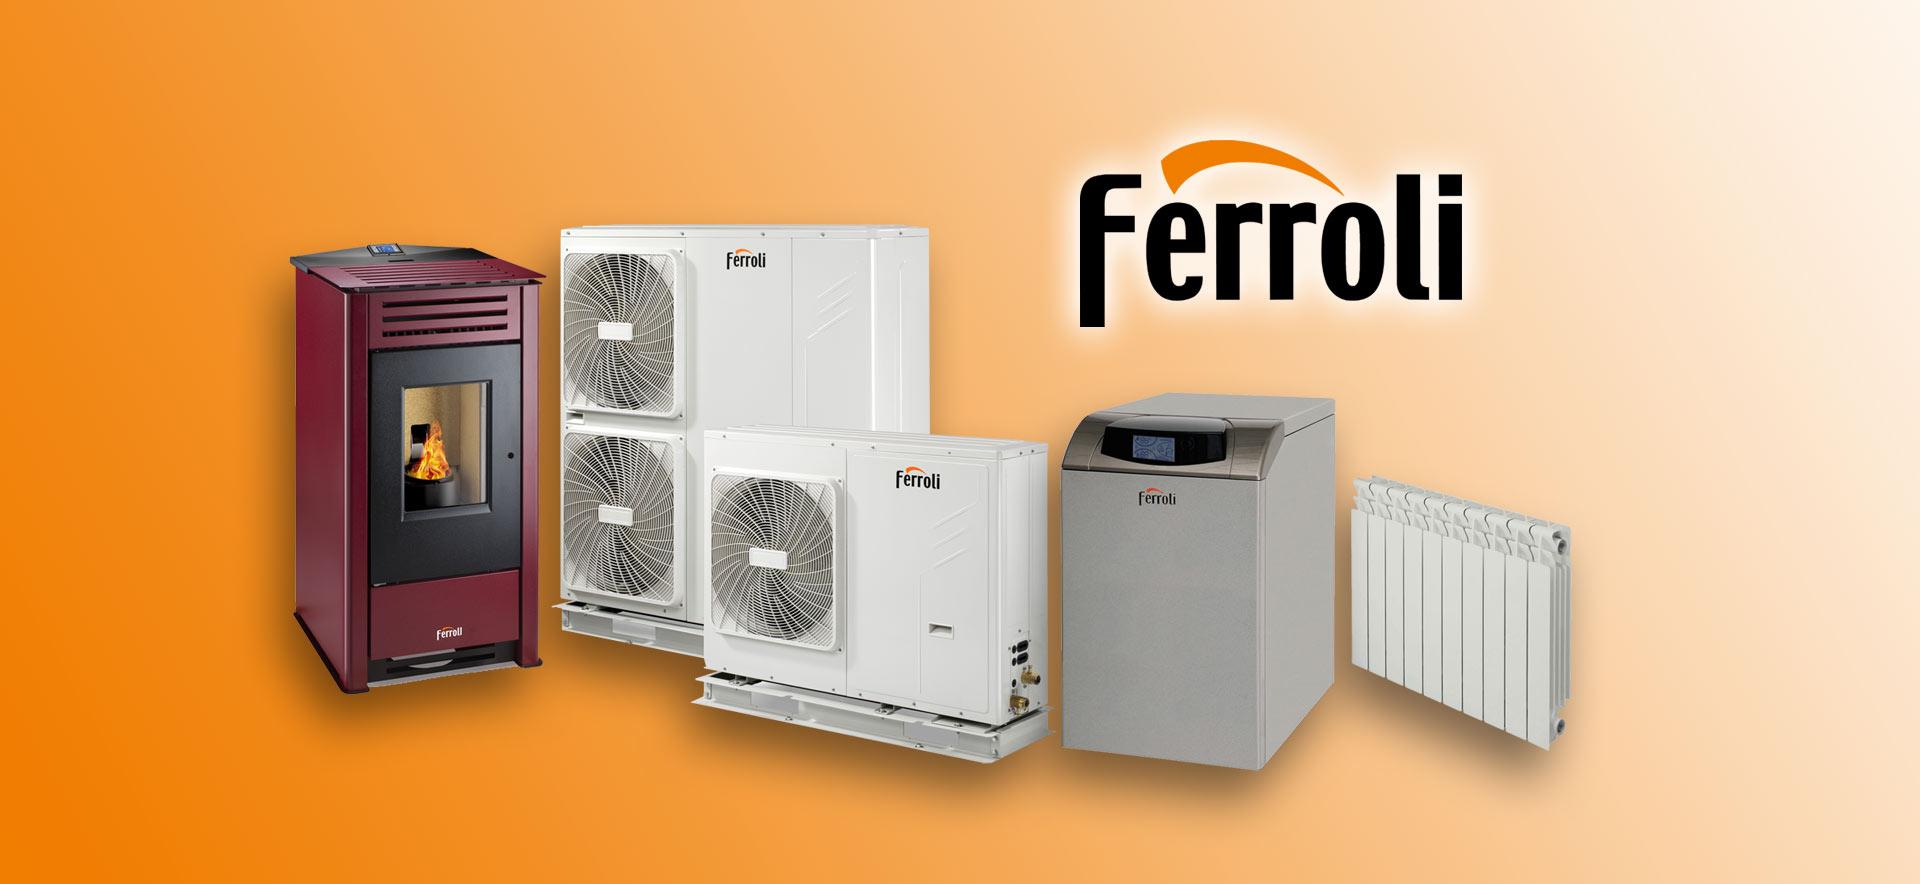 Fondo Ferroli empresa